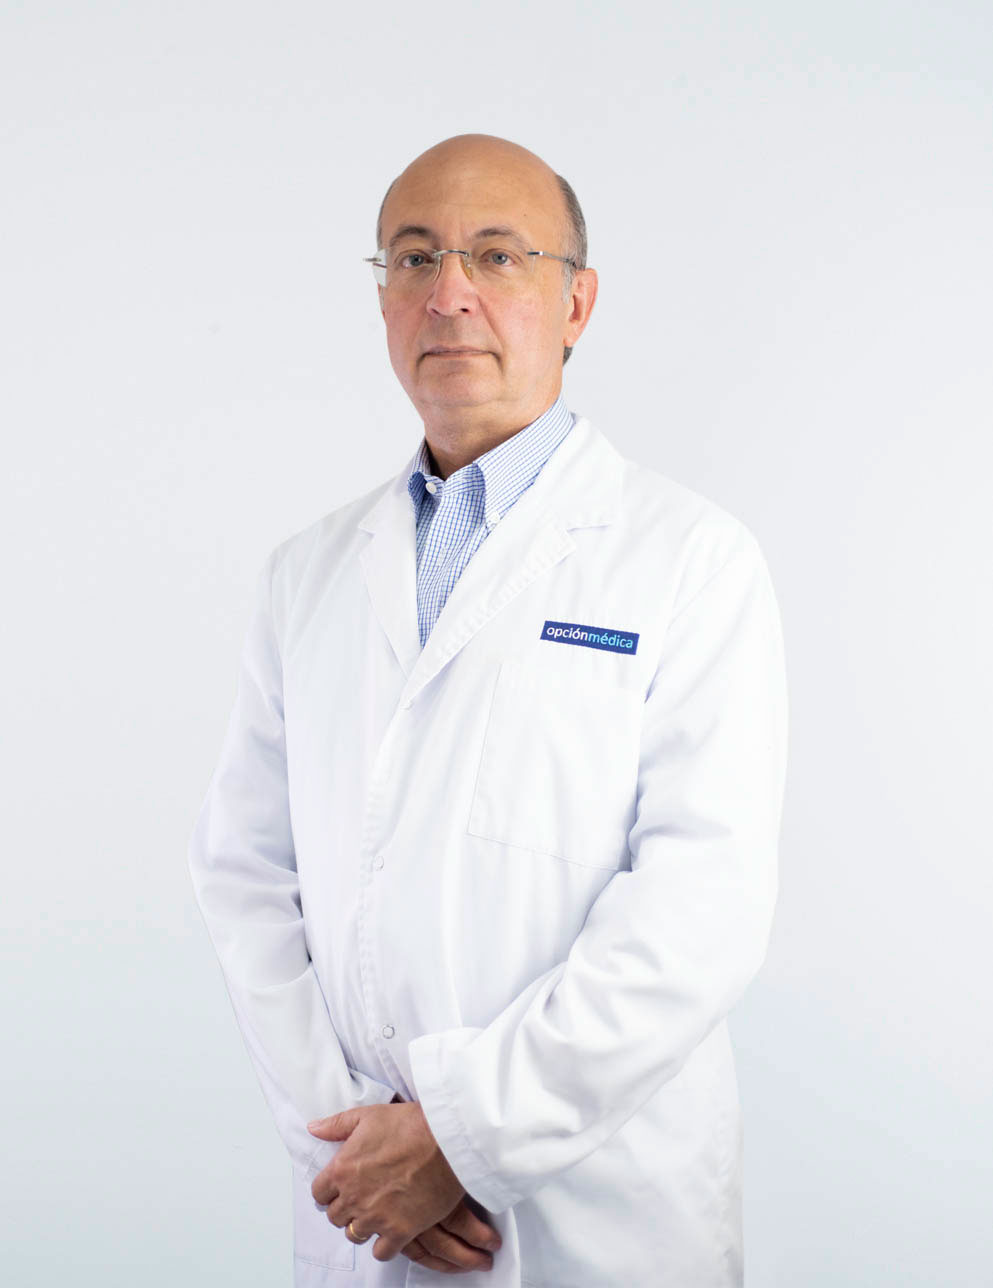 Dr. Jordi Pujol